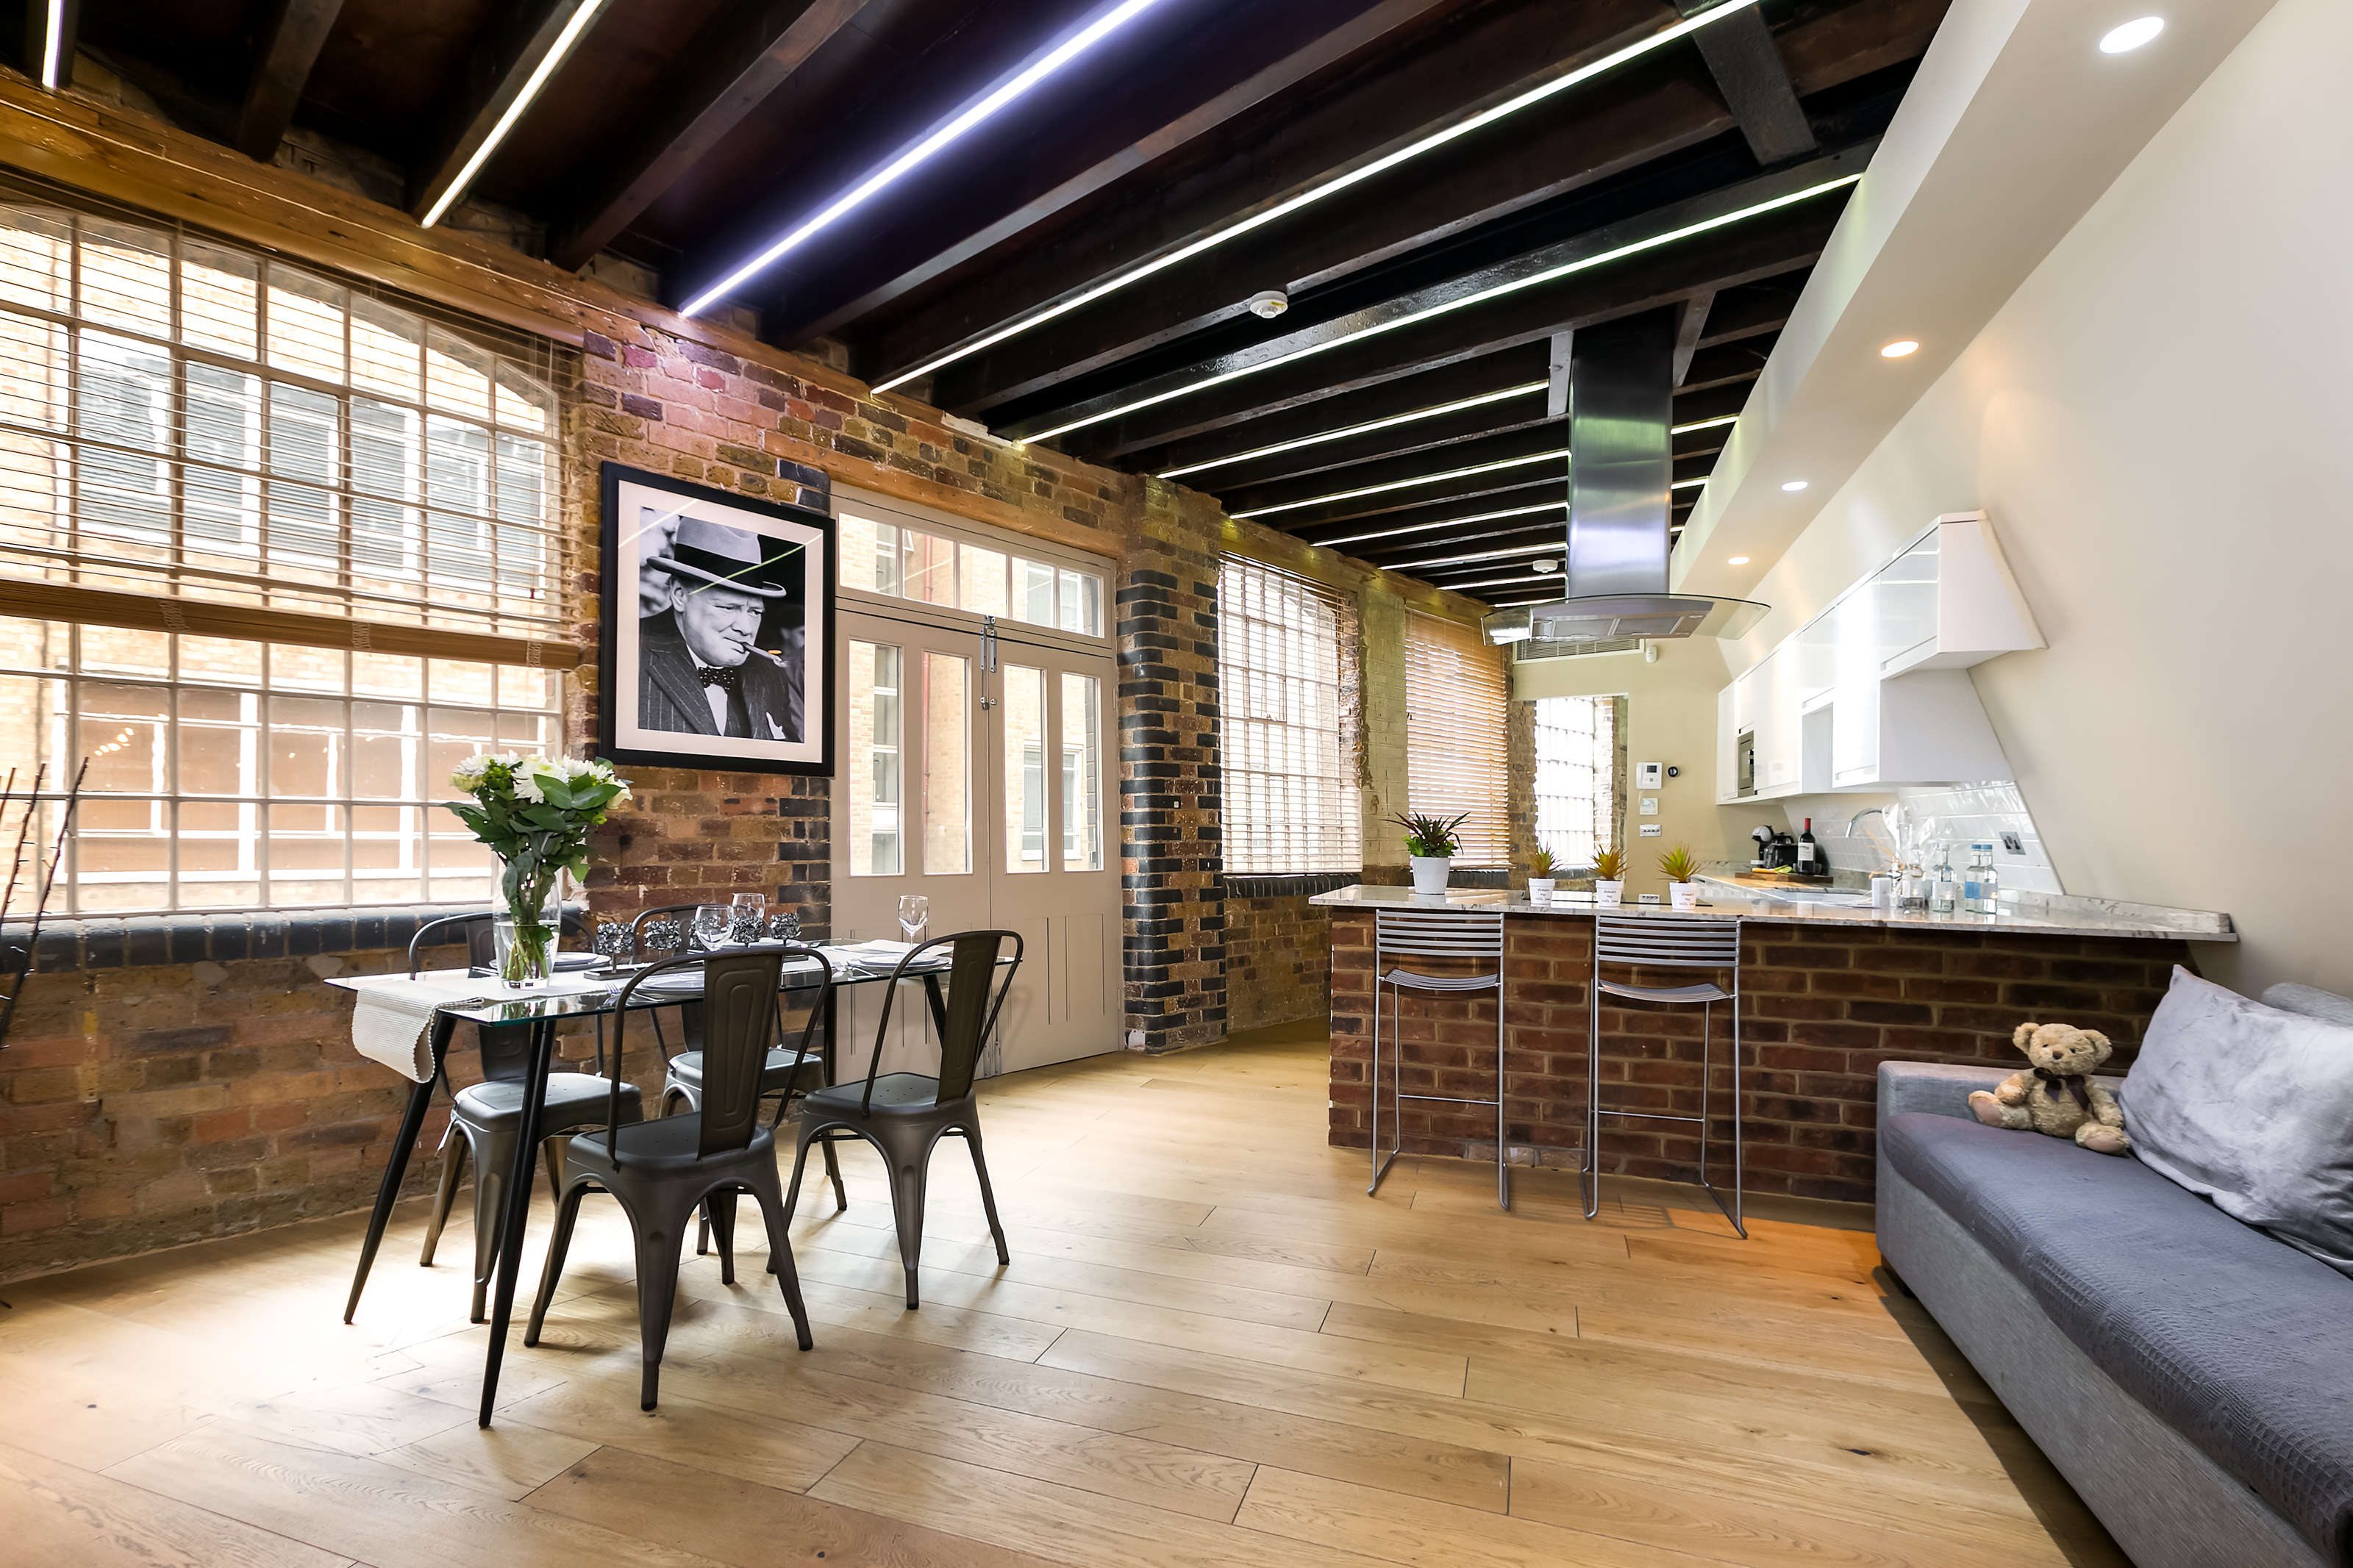 Lovelydays luxury service apartment rental - London - Fitzrovia - Wells Mews A - Lovelysuite - 2 bedrooms - 2 bathrooms - Luxury living room - 5 star serviced apartments in london - 4fcec0b49e27 - Lovelydays